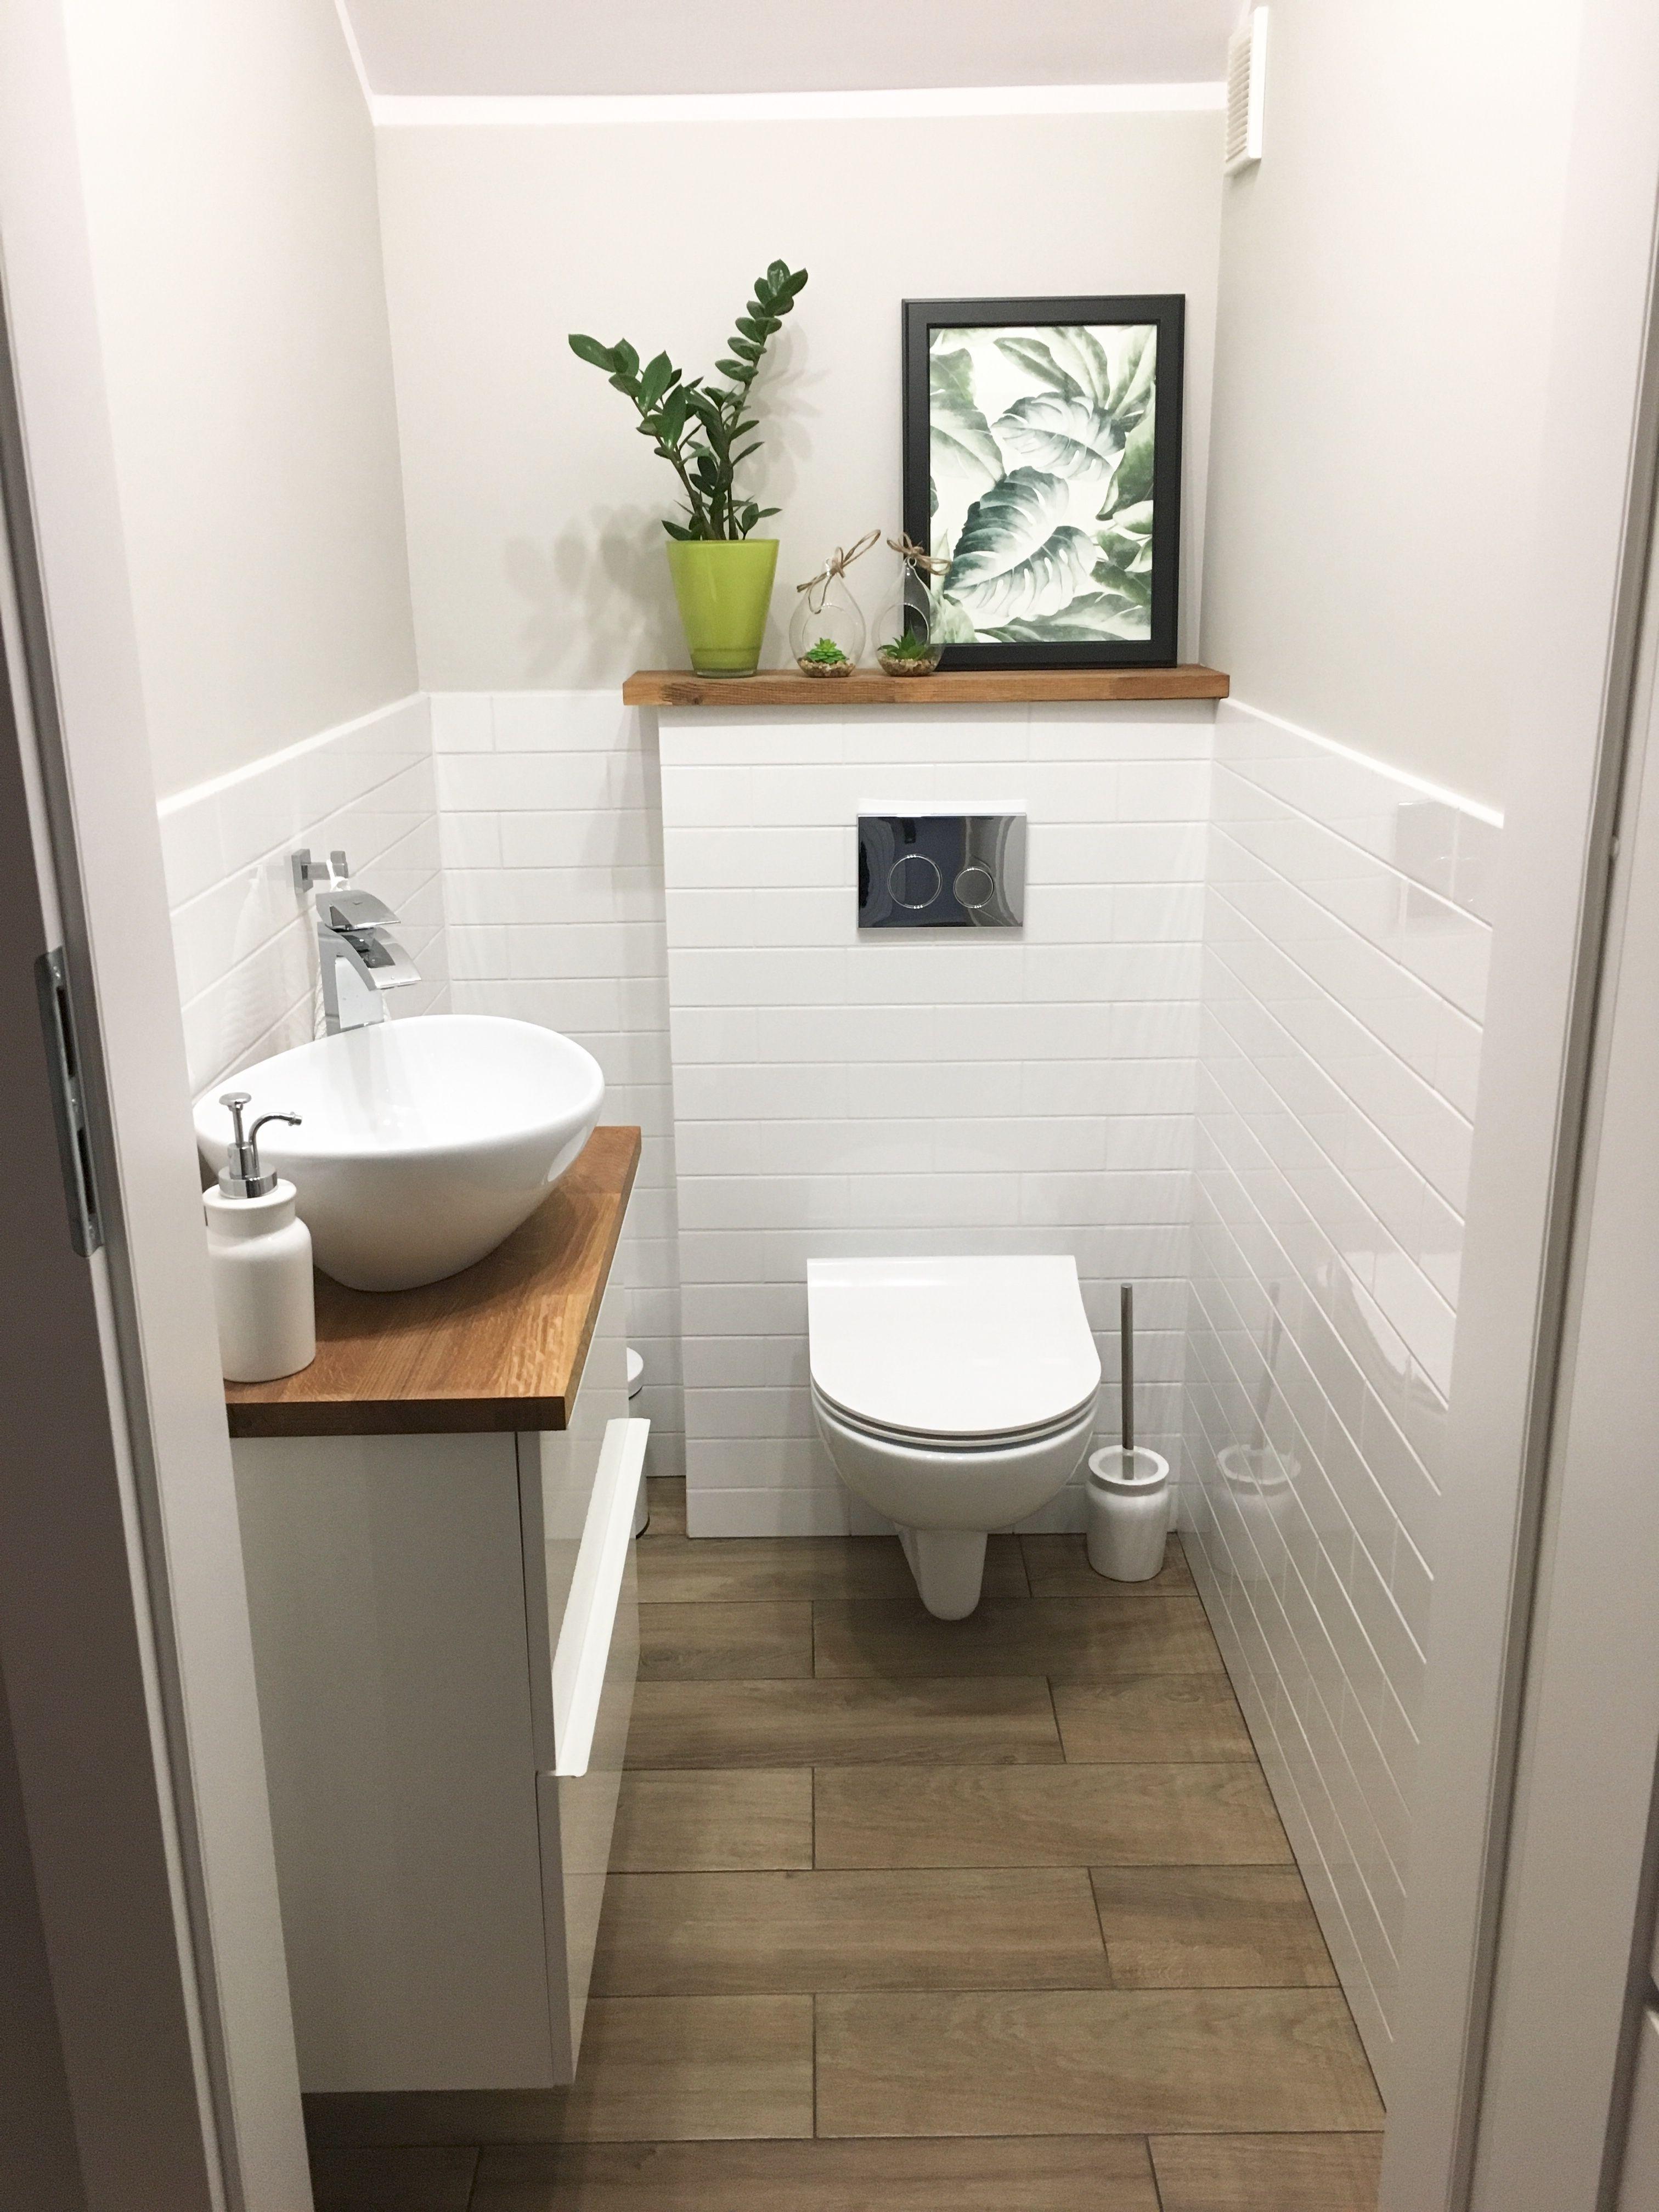 Toaleta pod schodami #downstairsloo Toaleta pod schodami #smalltoiletroom